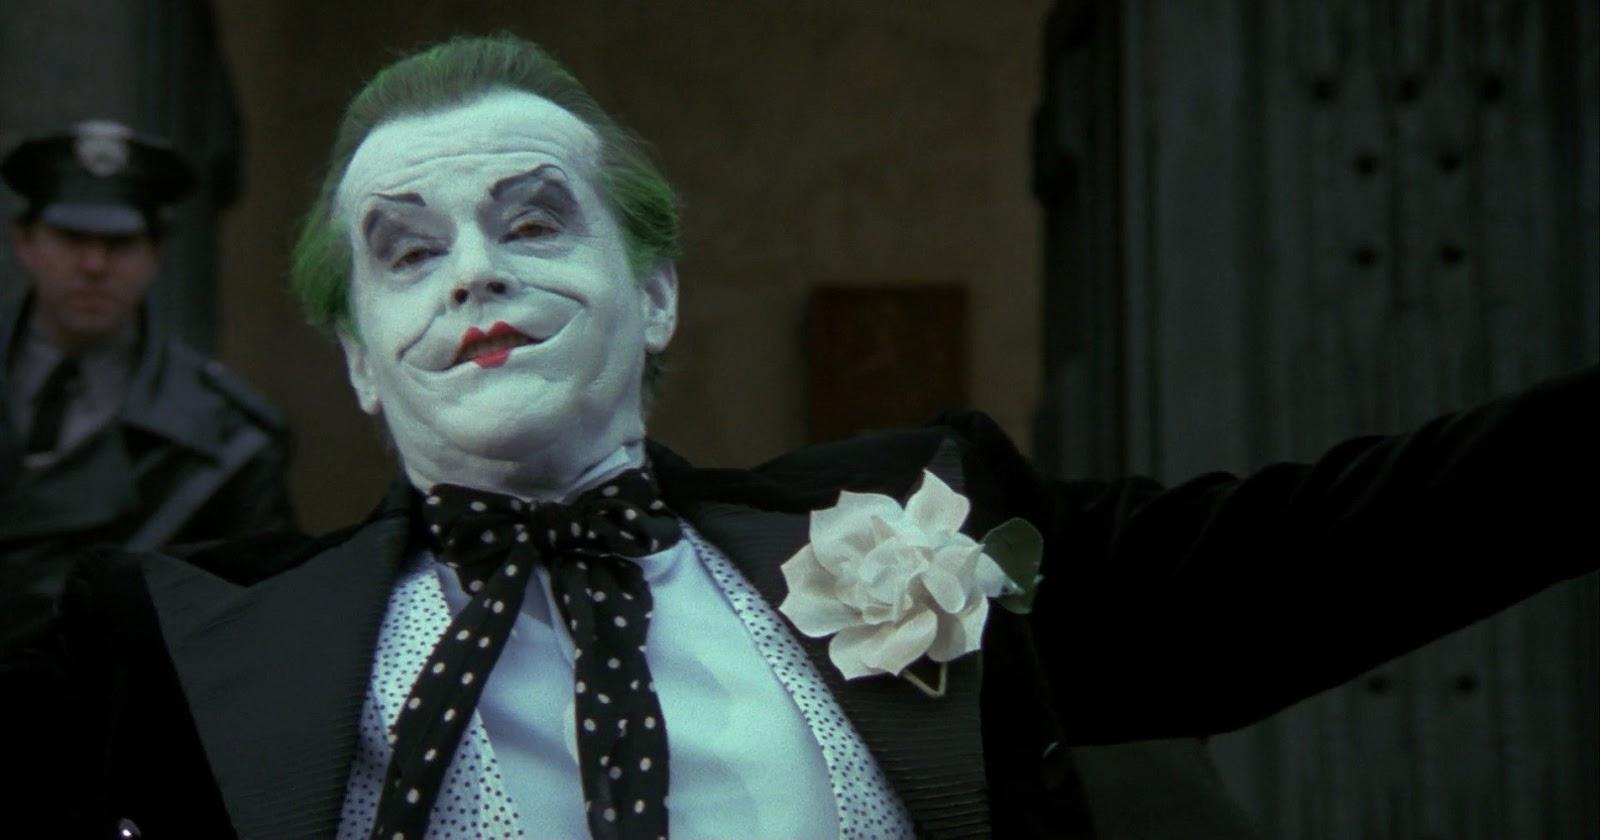 NEXT The Jokeru0027s Costumes (chronologically) part 2  sc 1 st  Batman Joker Costume Guide & Batman: Joker Costume Guide: The Jokeru0027s Costumes (chronologically ...